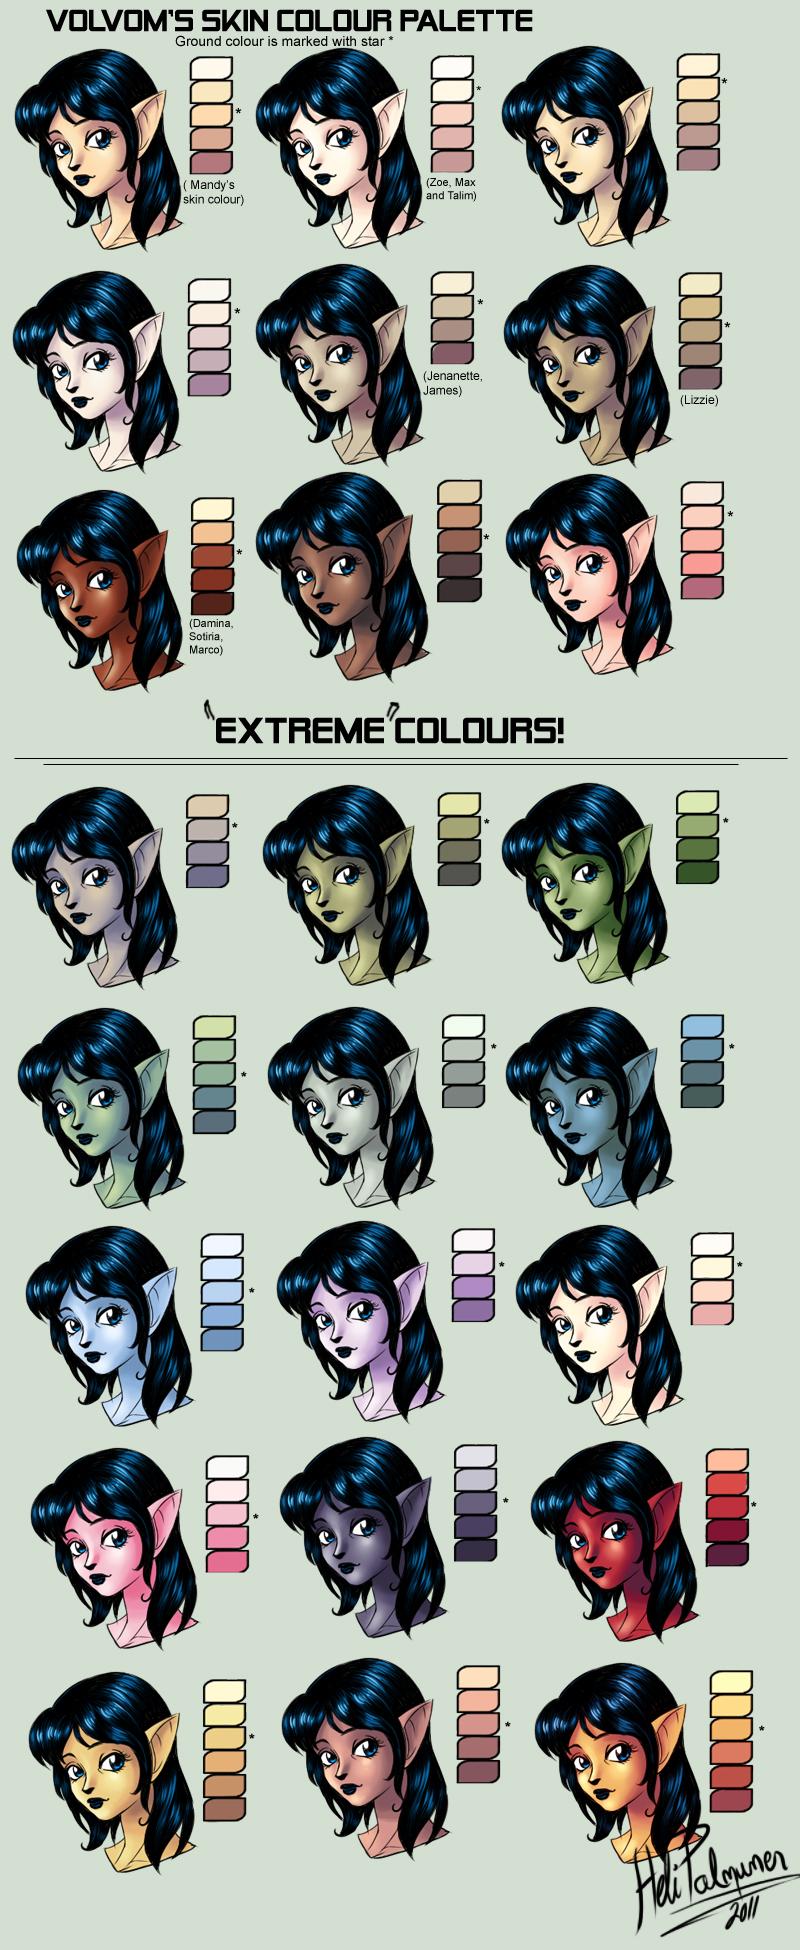 Character Design Colour Palette : My skin colour palette by volvom on deviantart